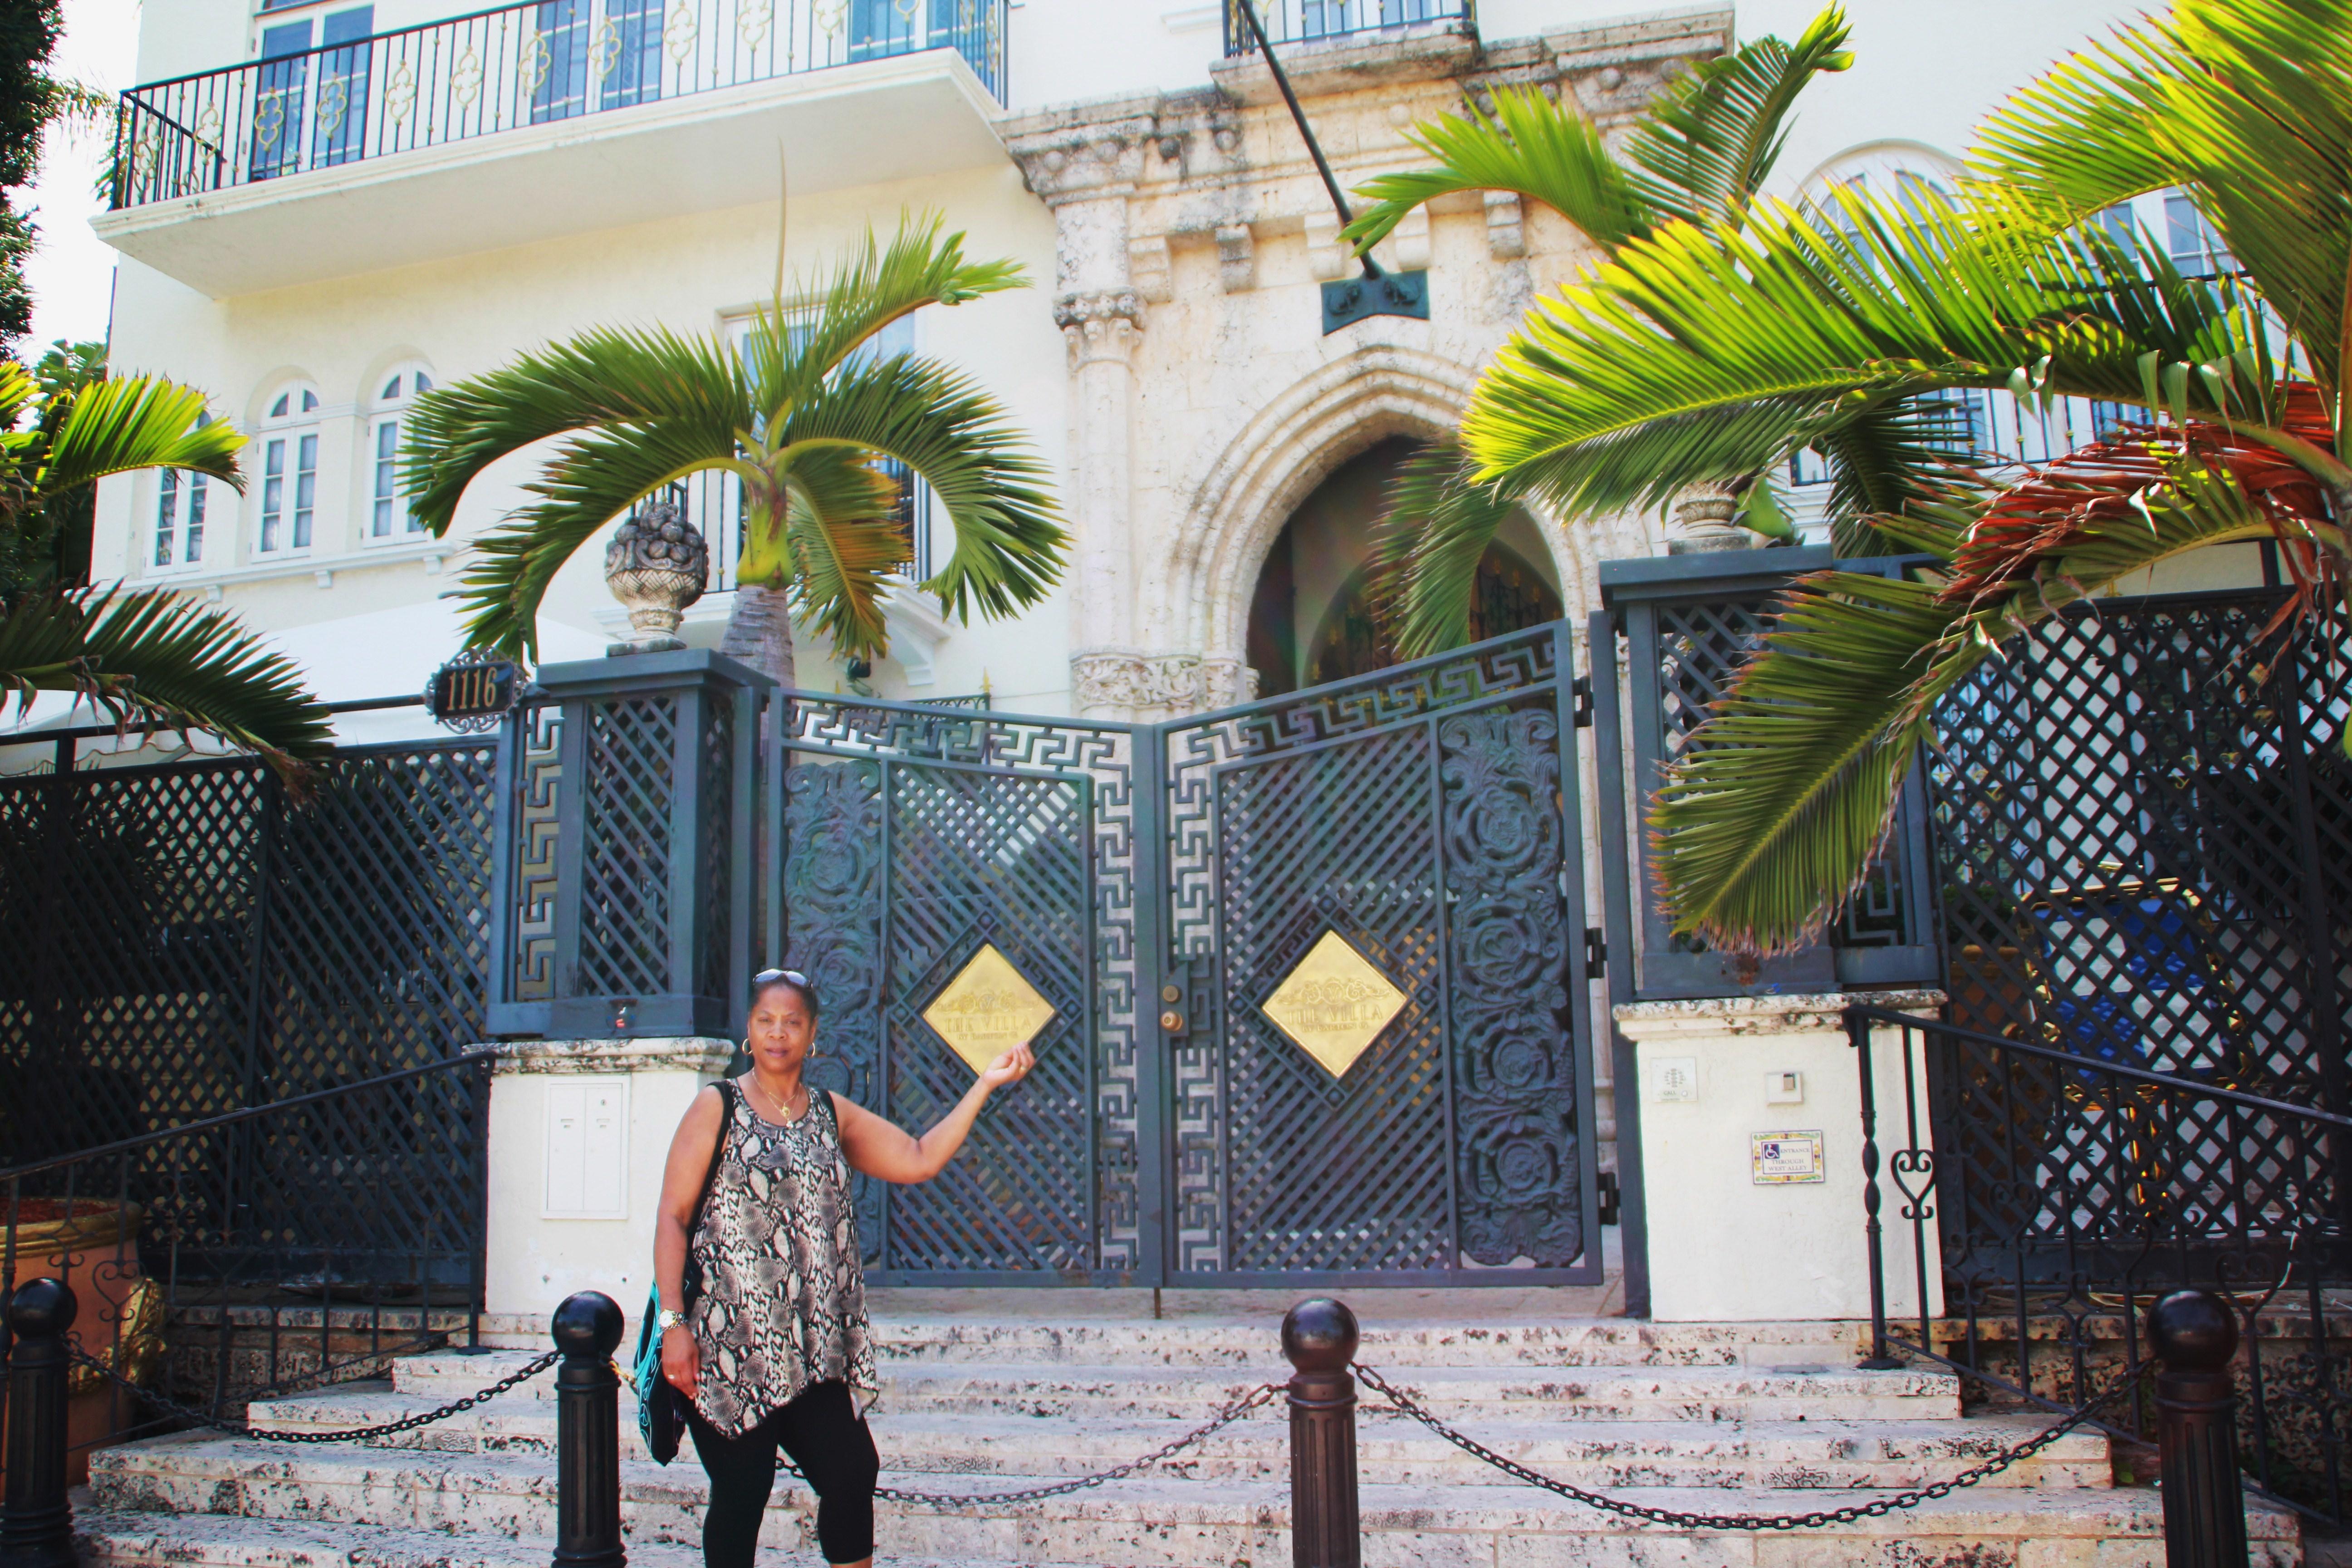 Versace Home Miami south miami miami and more miami travels with miha